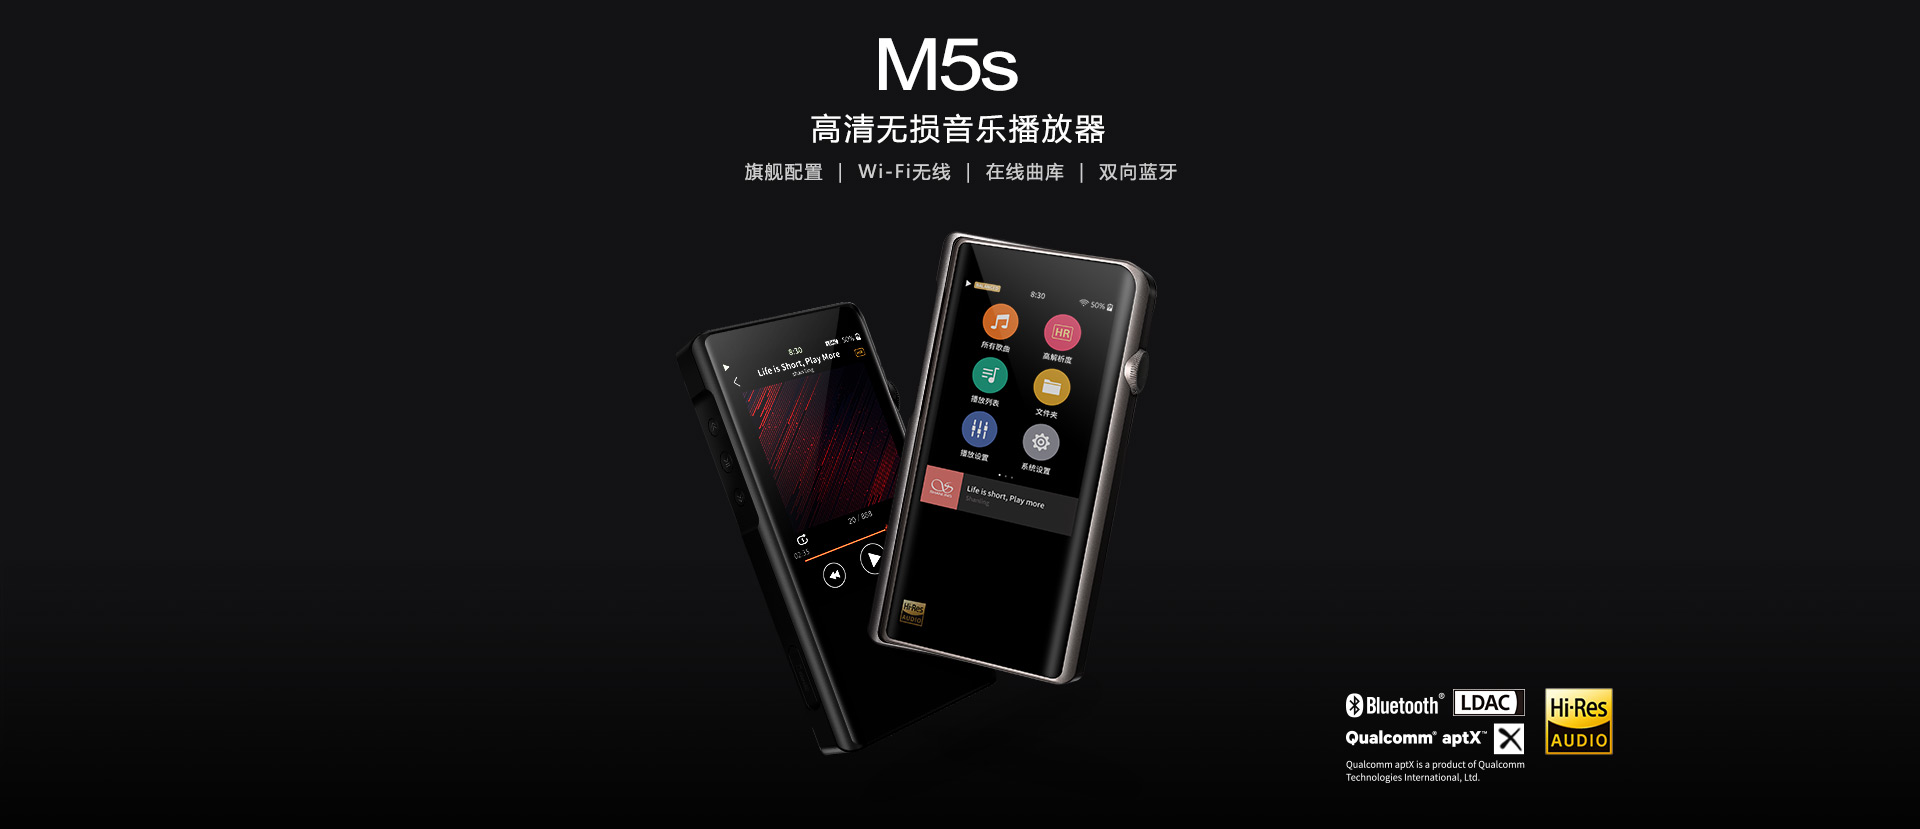 m5s_02.jpg